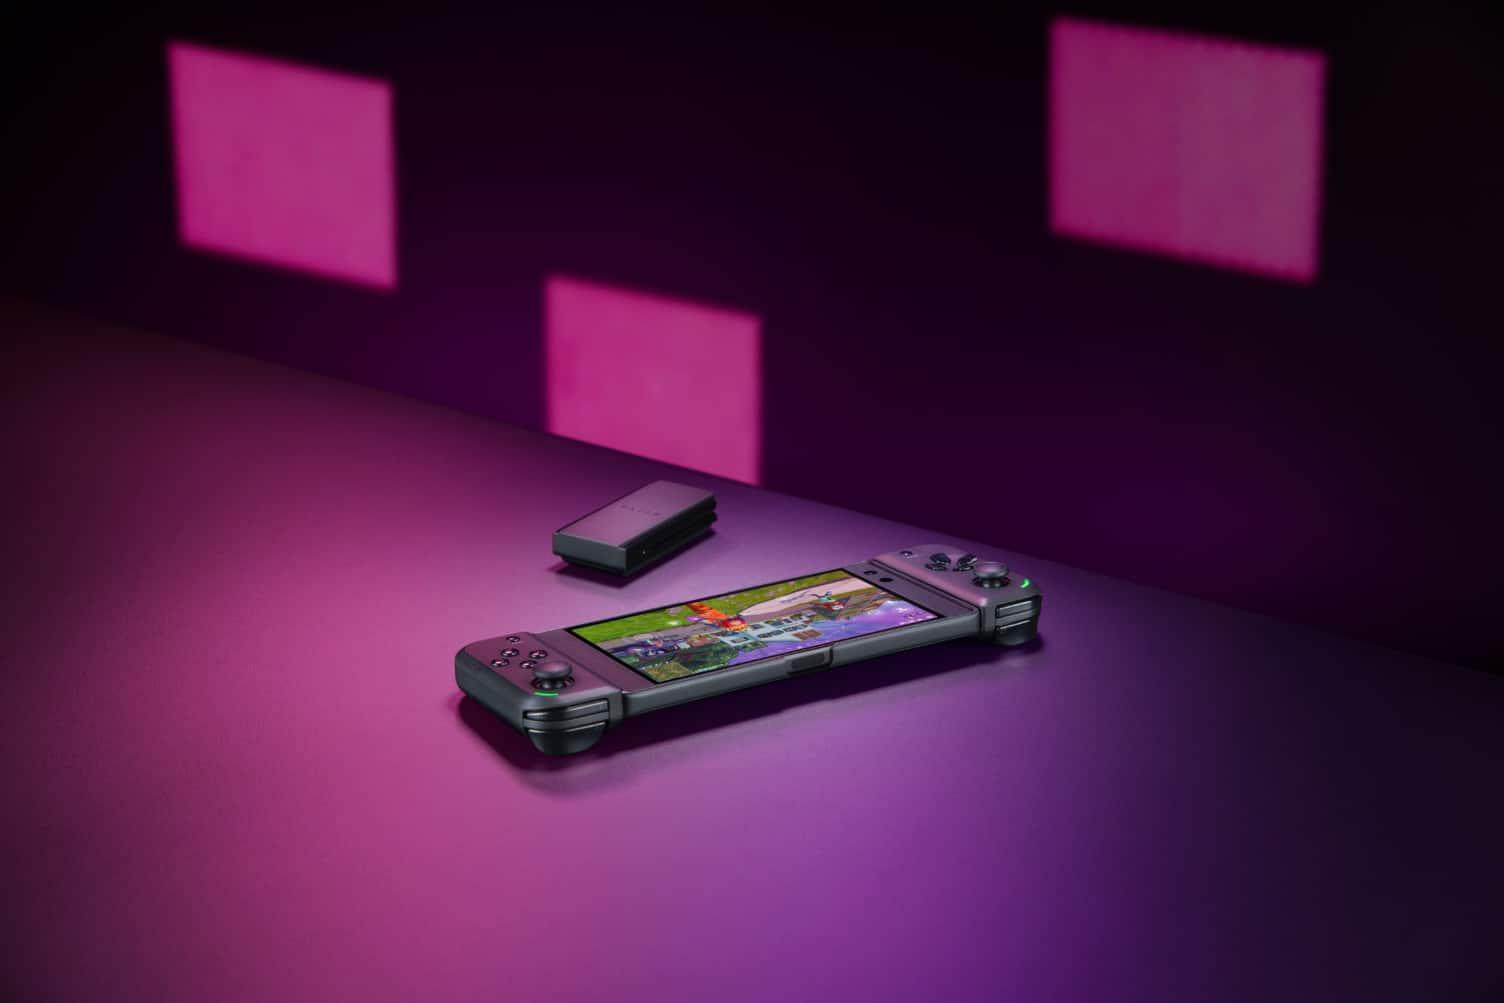 Razer Junglecat Mobile Game Controller 15